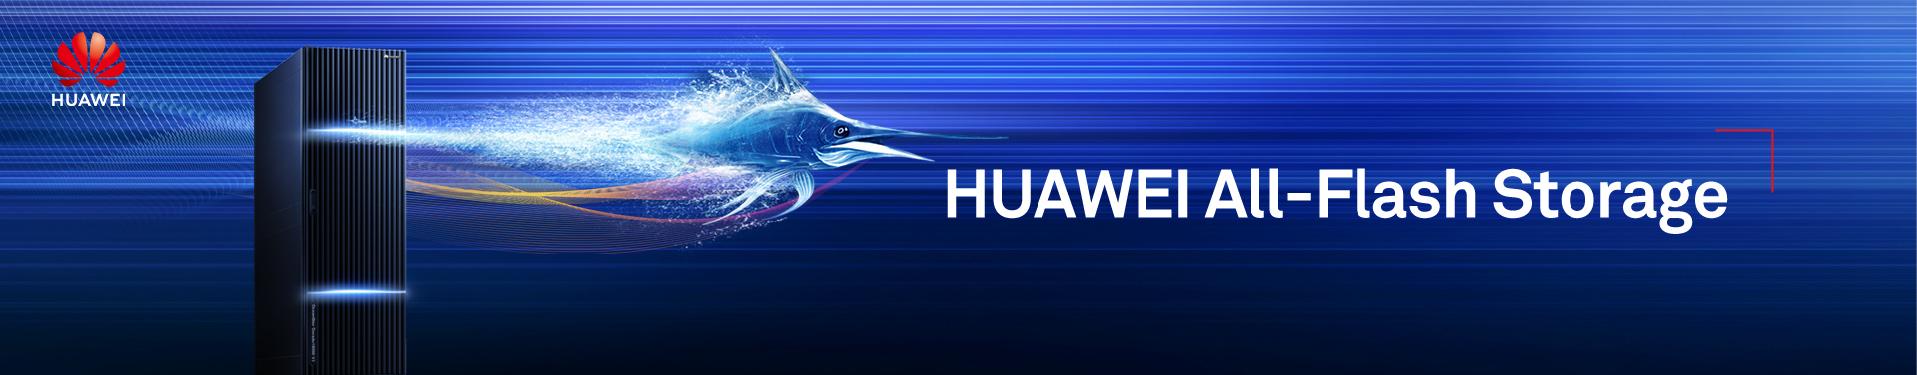 Huawei - Storage